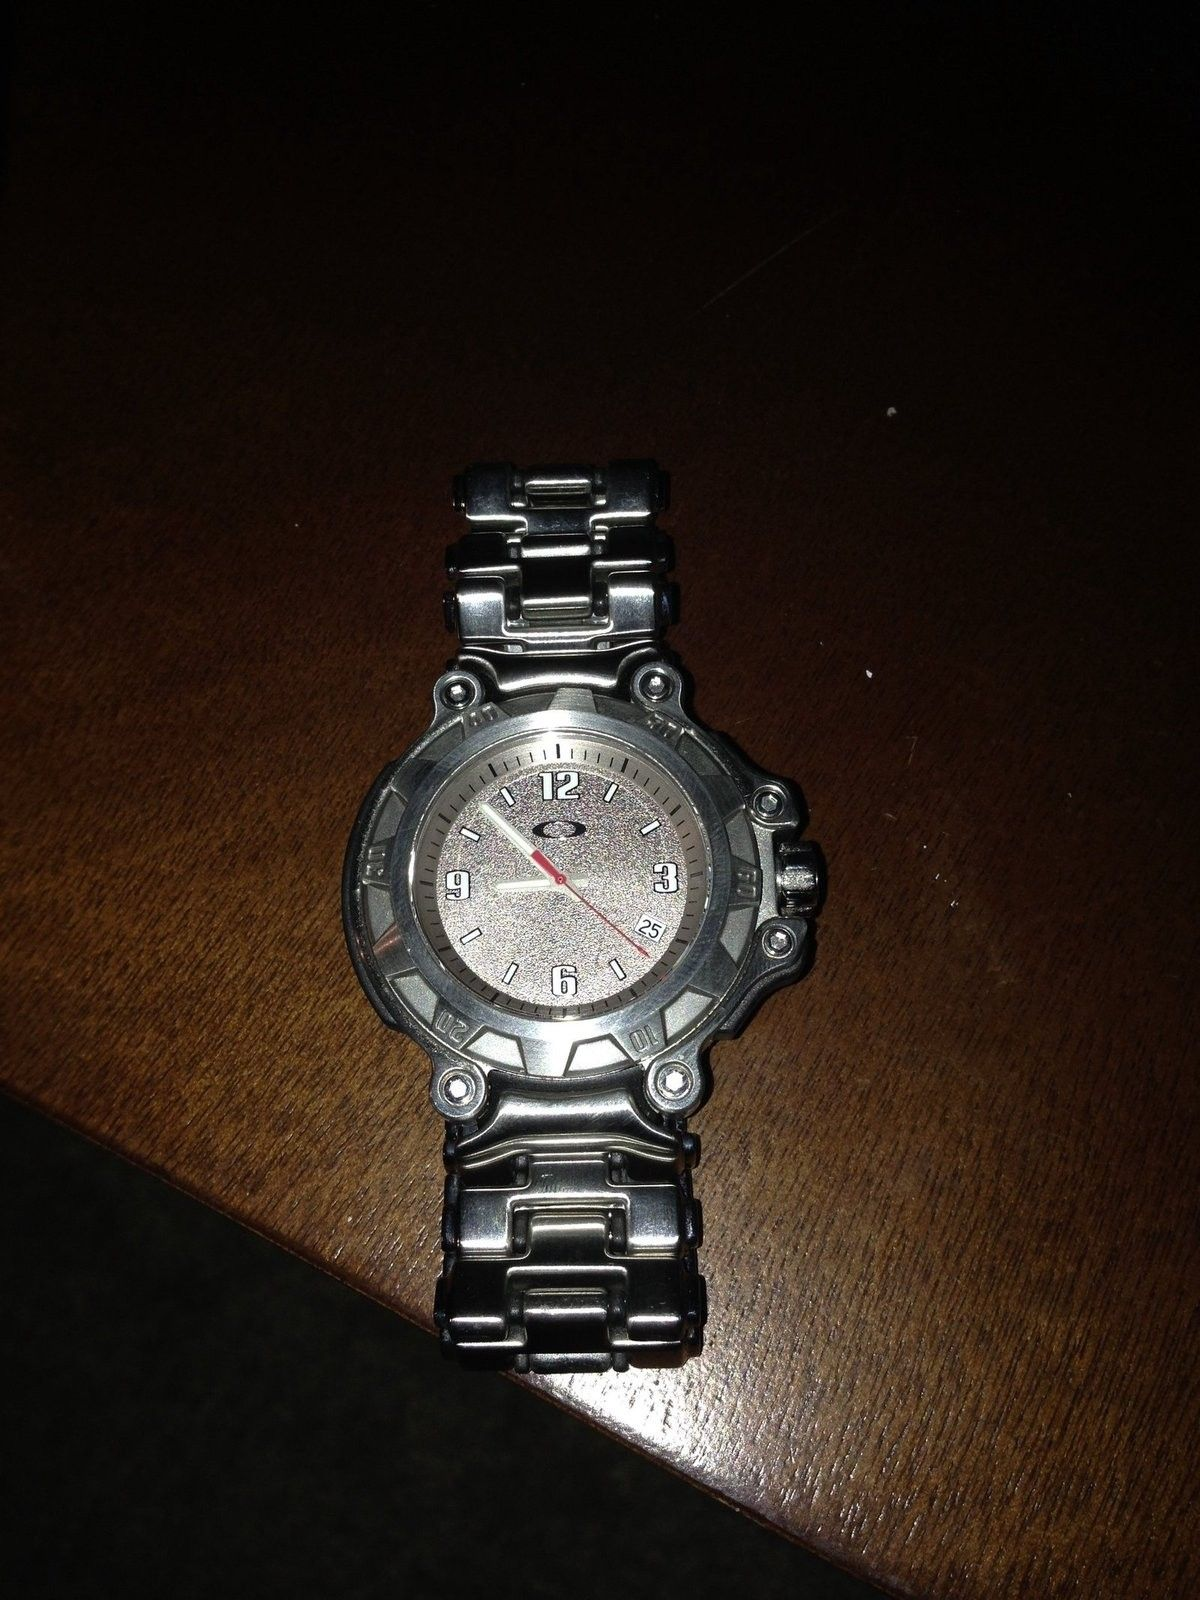 Crank case watch lnib w extra links - image.jpg